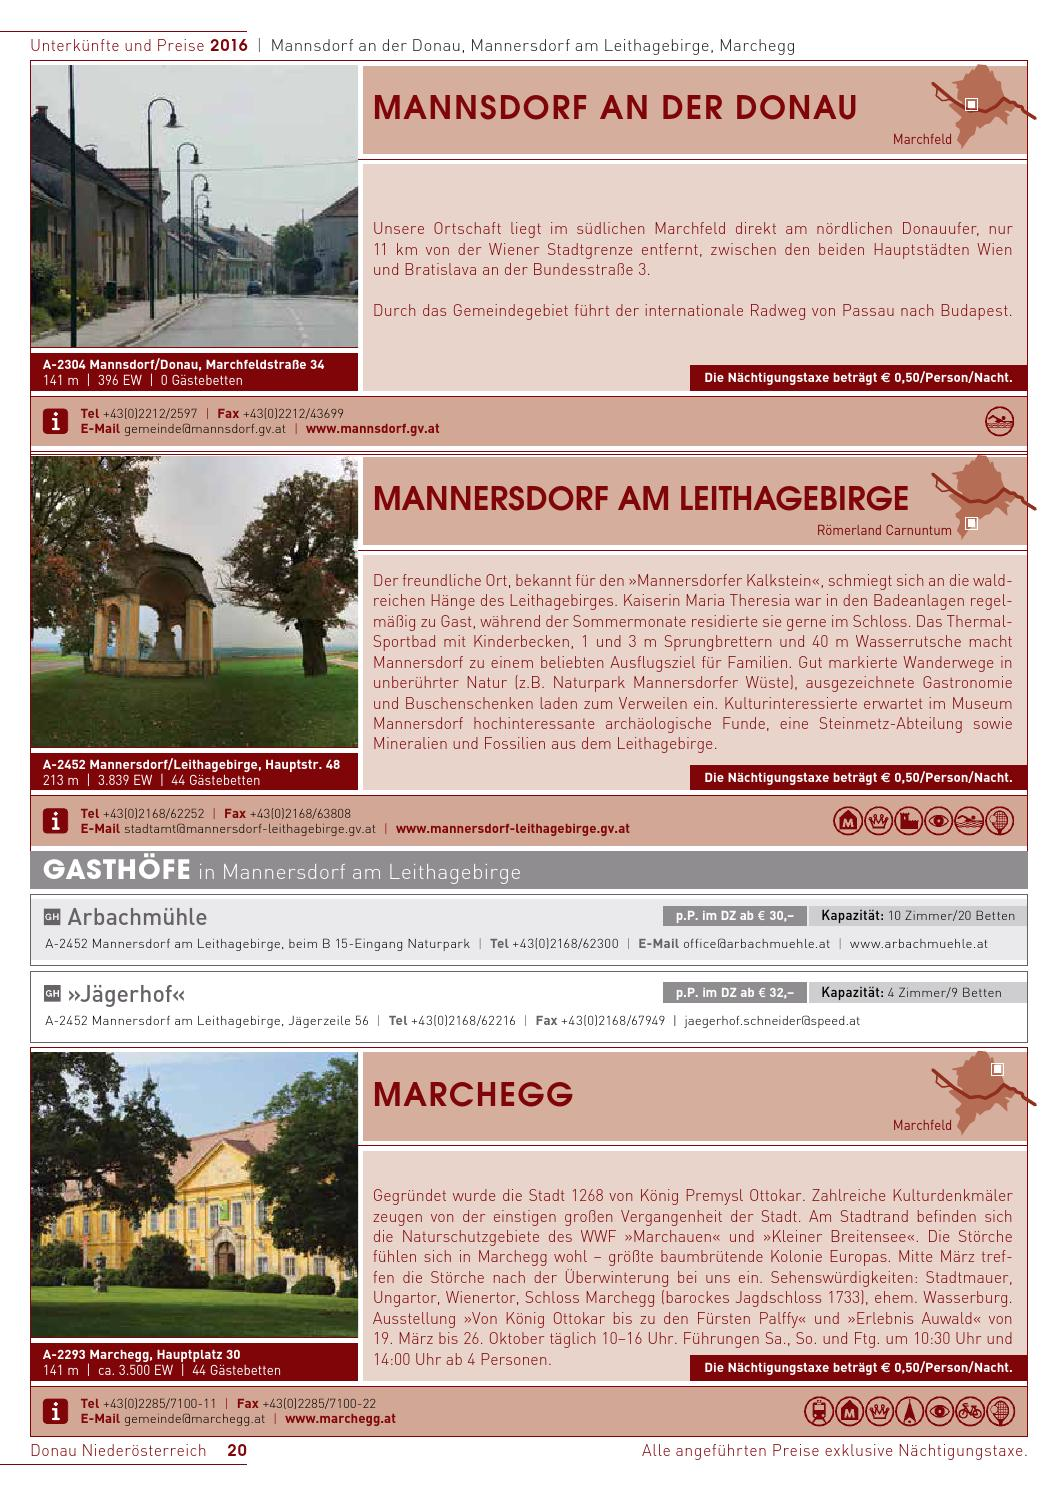 Vcklabruck Private Kontakte Mannersdorf am Leithagebirge